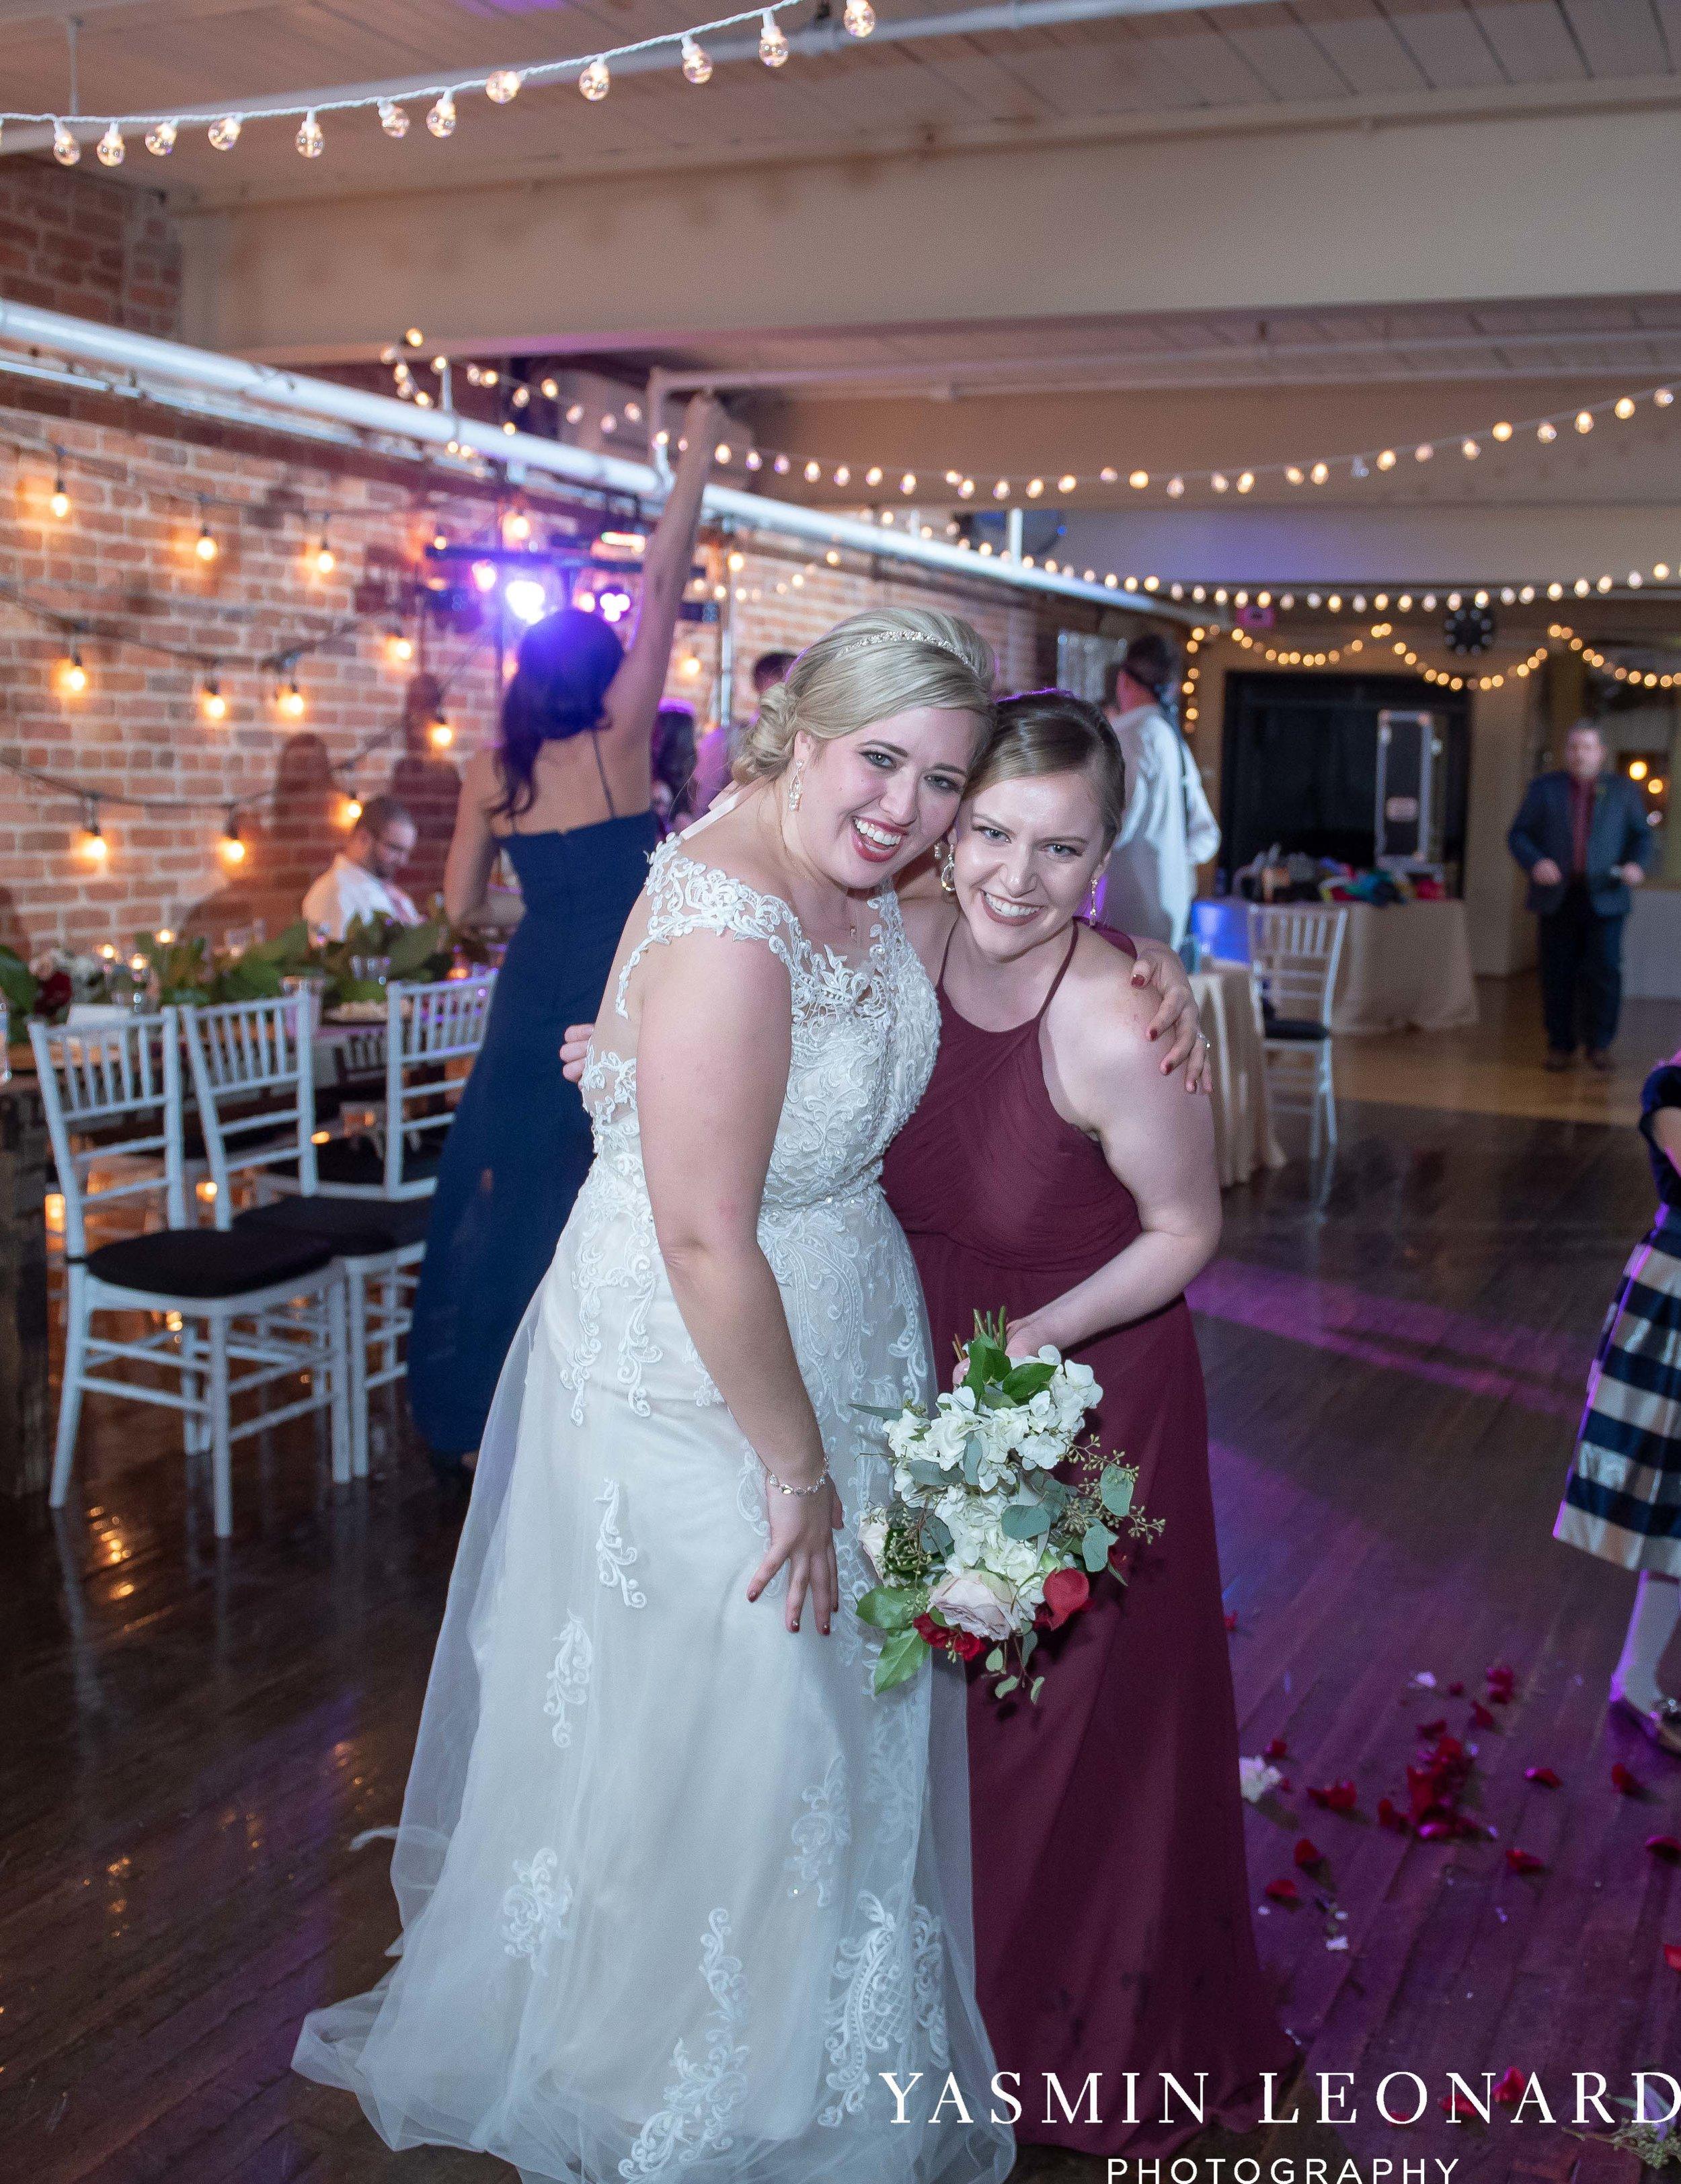 Rebekah and Matt - 105 Worth Event Centre - Yasmin Leonard Photography - Asheboro Wedding - NC Wedding - High Point Weddings - Triad Weddings - Winter Wedding-69.jpg